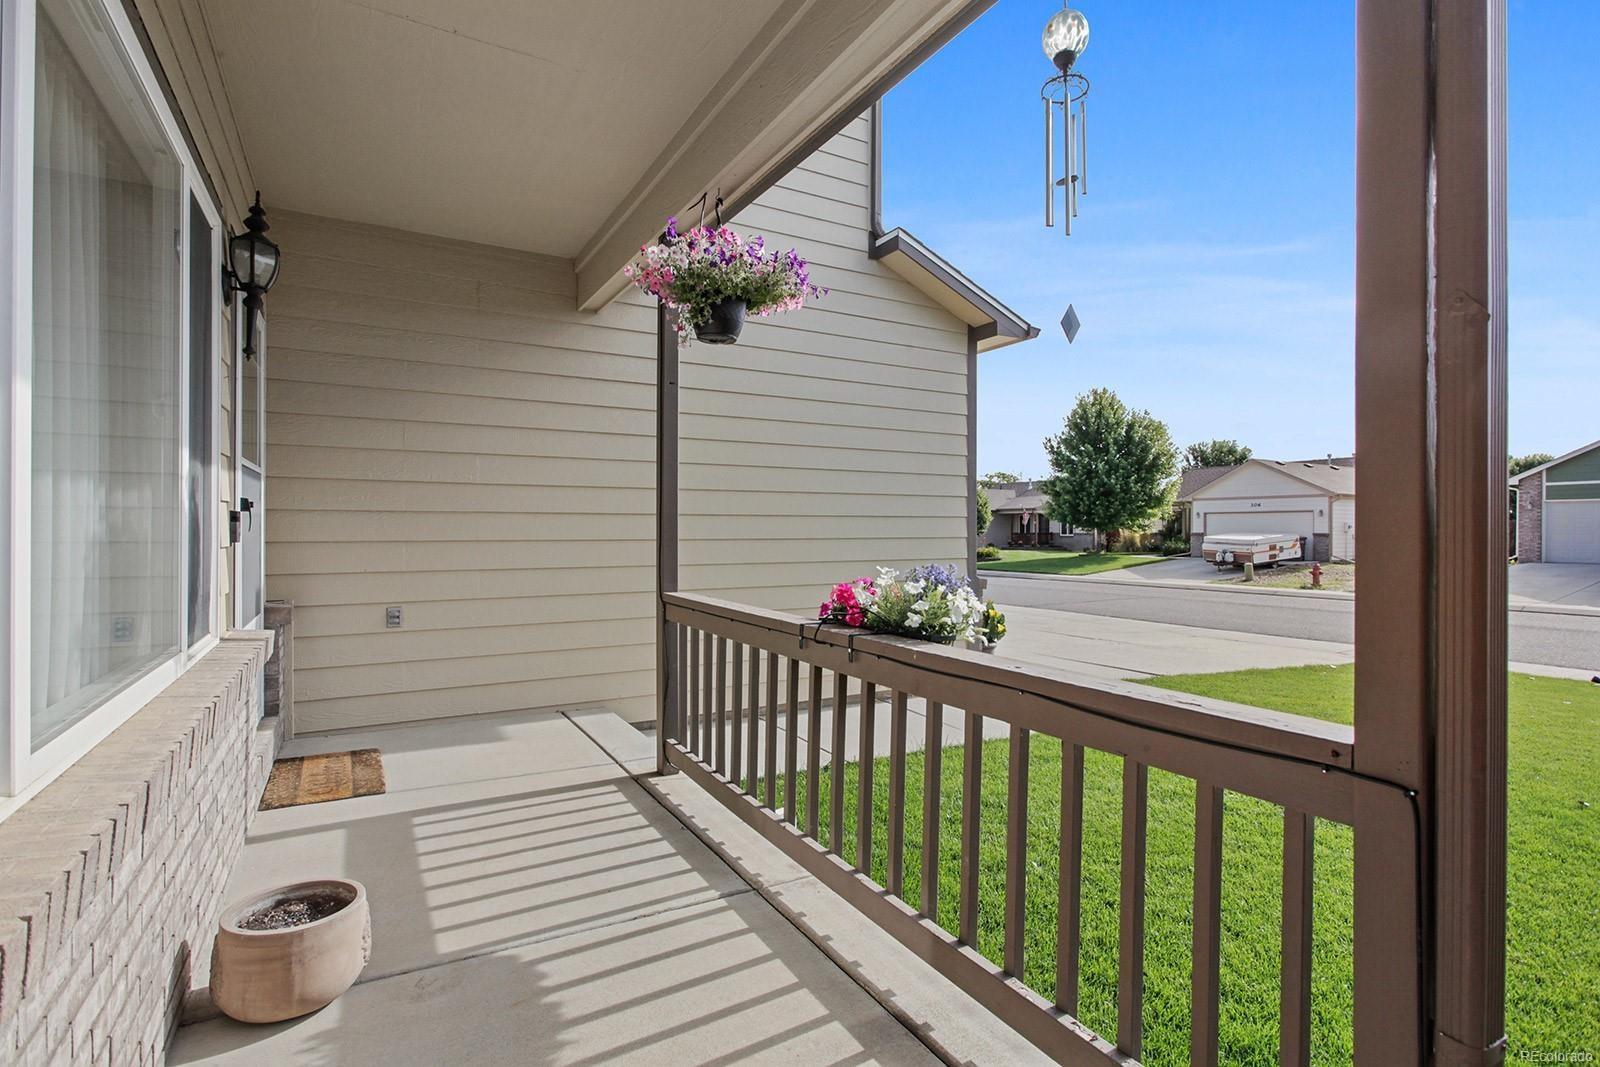 MLS# 5196946 - 3 - 305 Coal Ridge Drive, Frederick, CO 80530